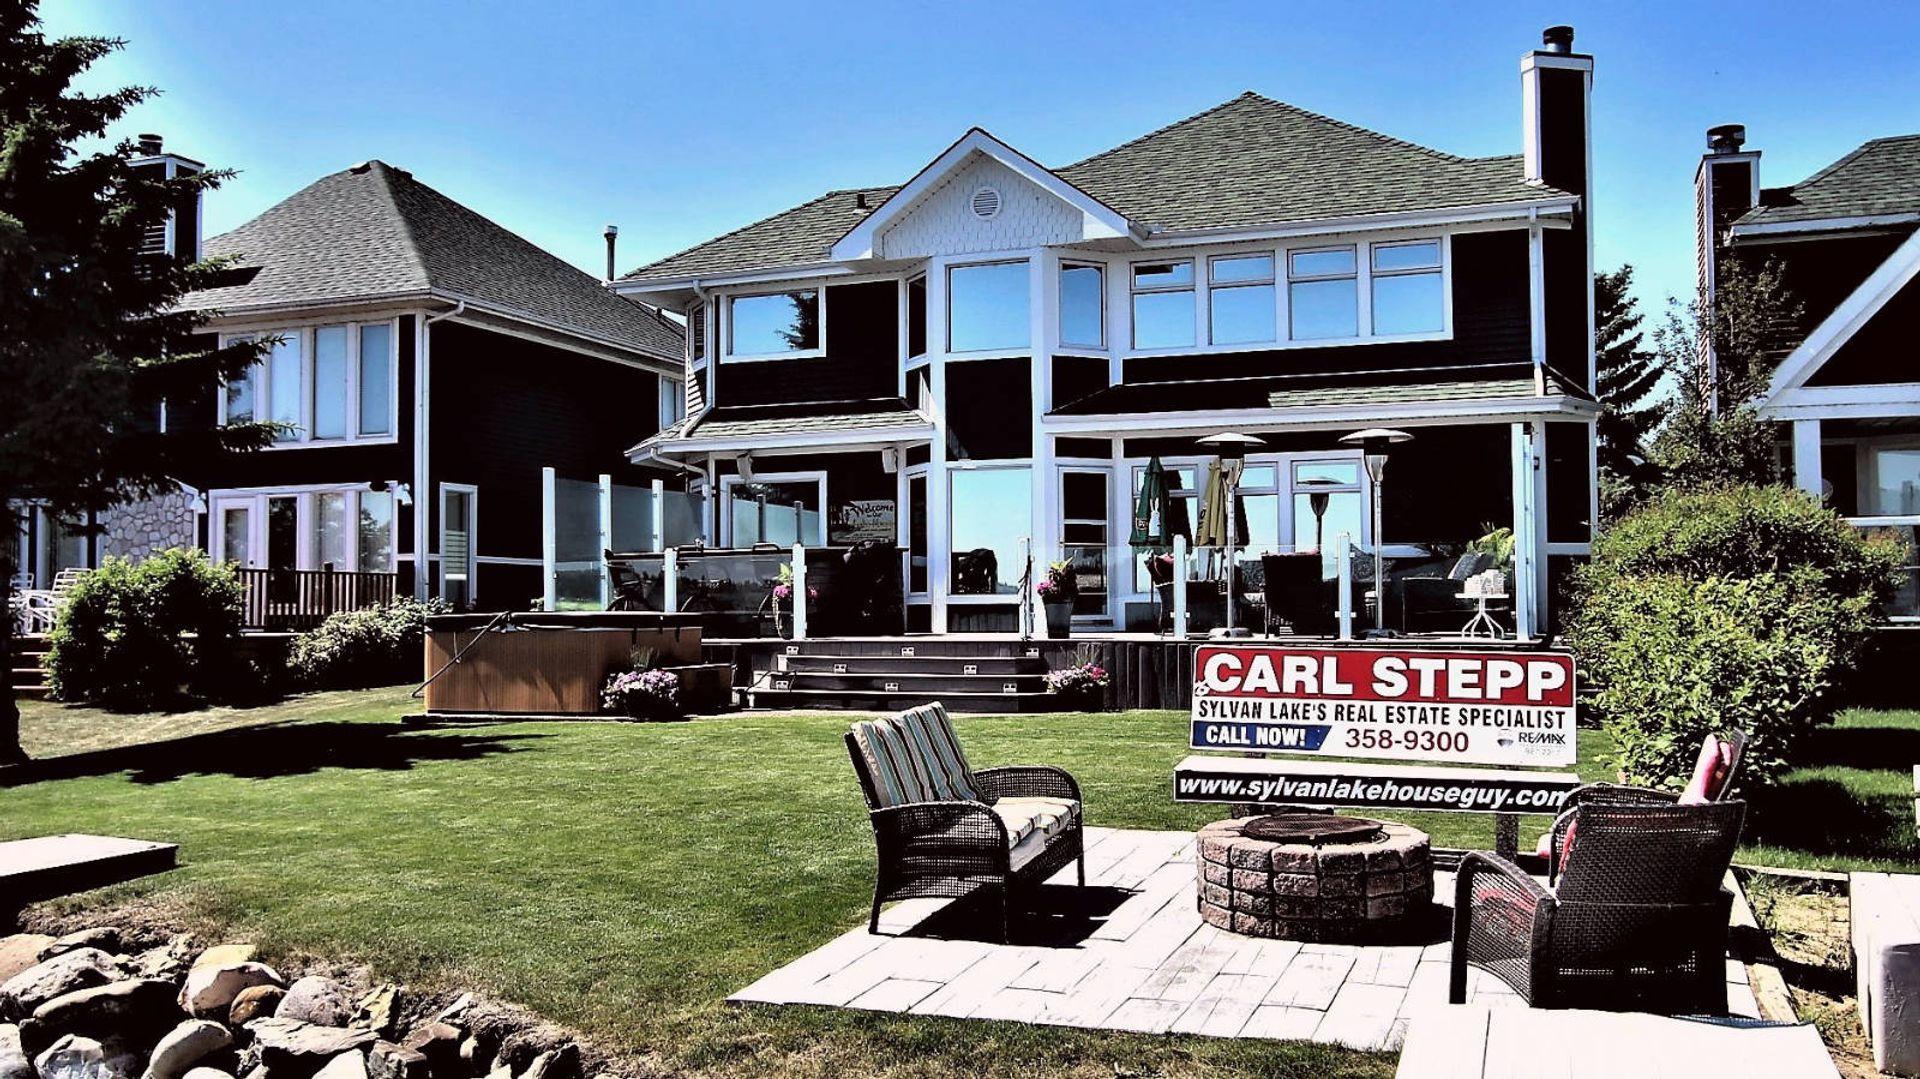 Carl Stepp, REMAX Realtor Sylvan Lake, Red Deer   Carl Stepp REMAX ...